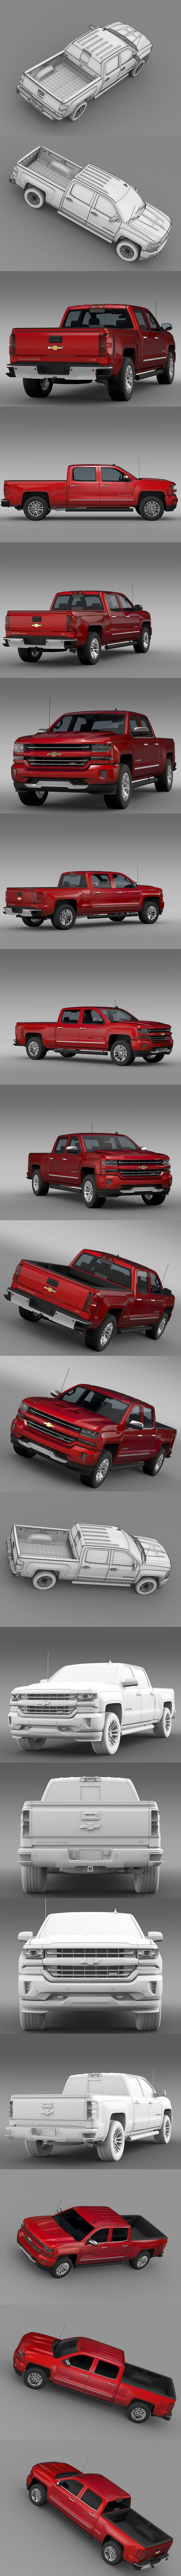 Pin On 3d Vehicles